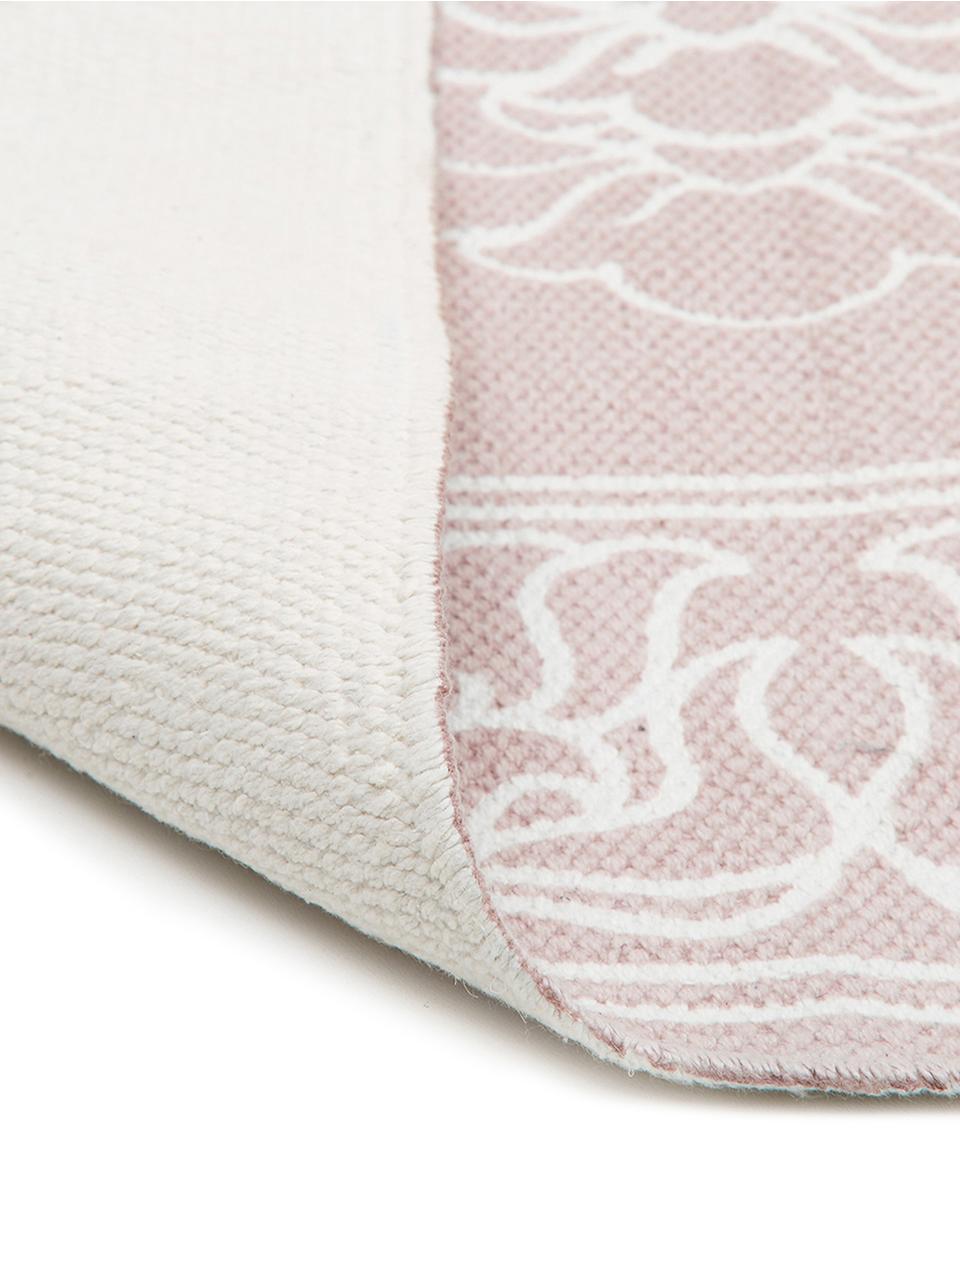 tapis boheme rose et blanc tisse main salima